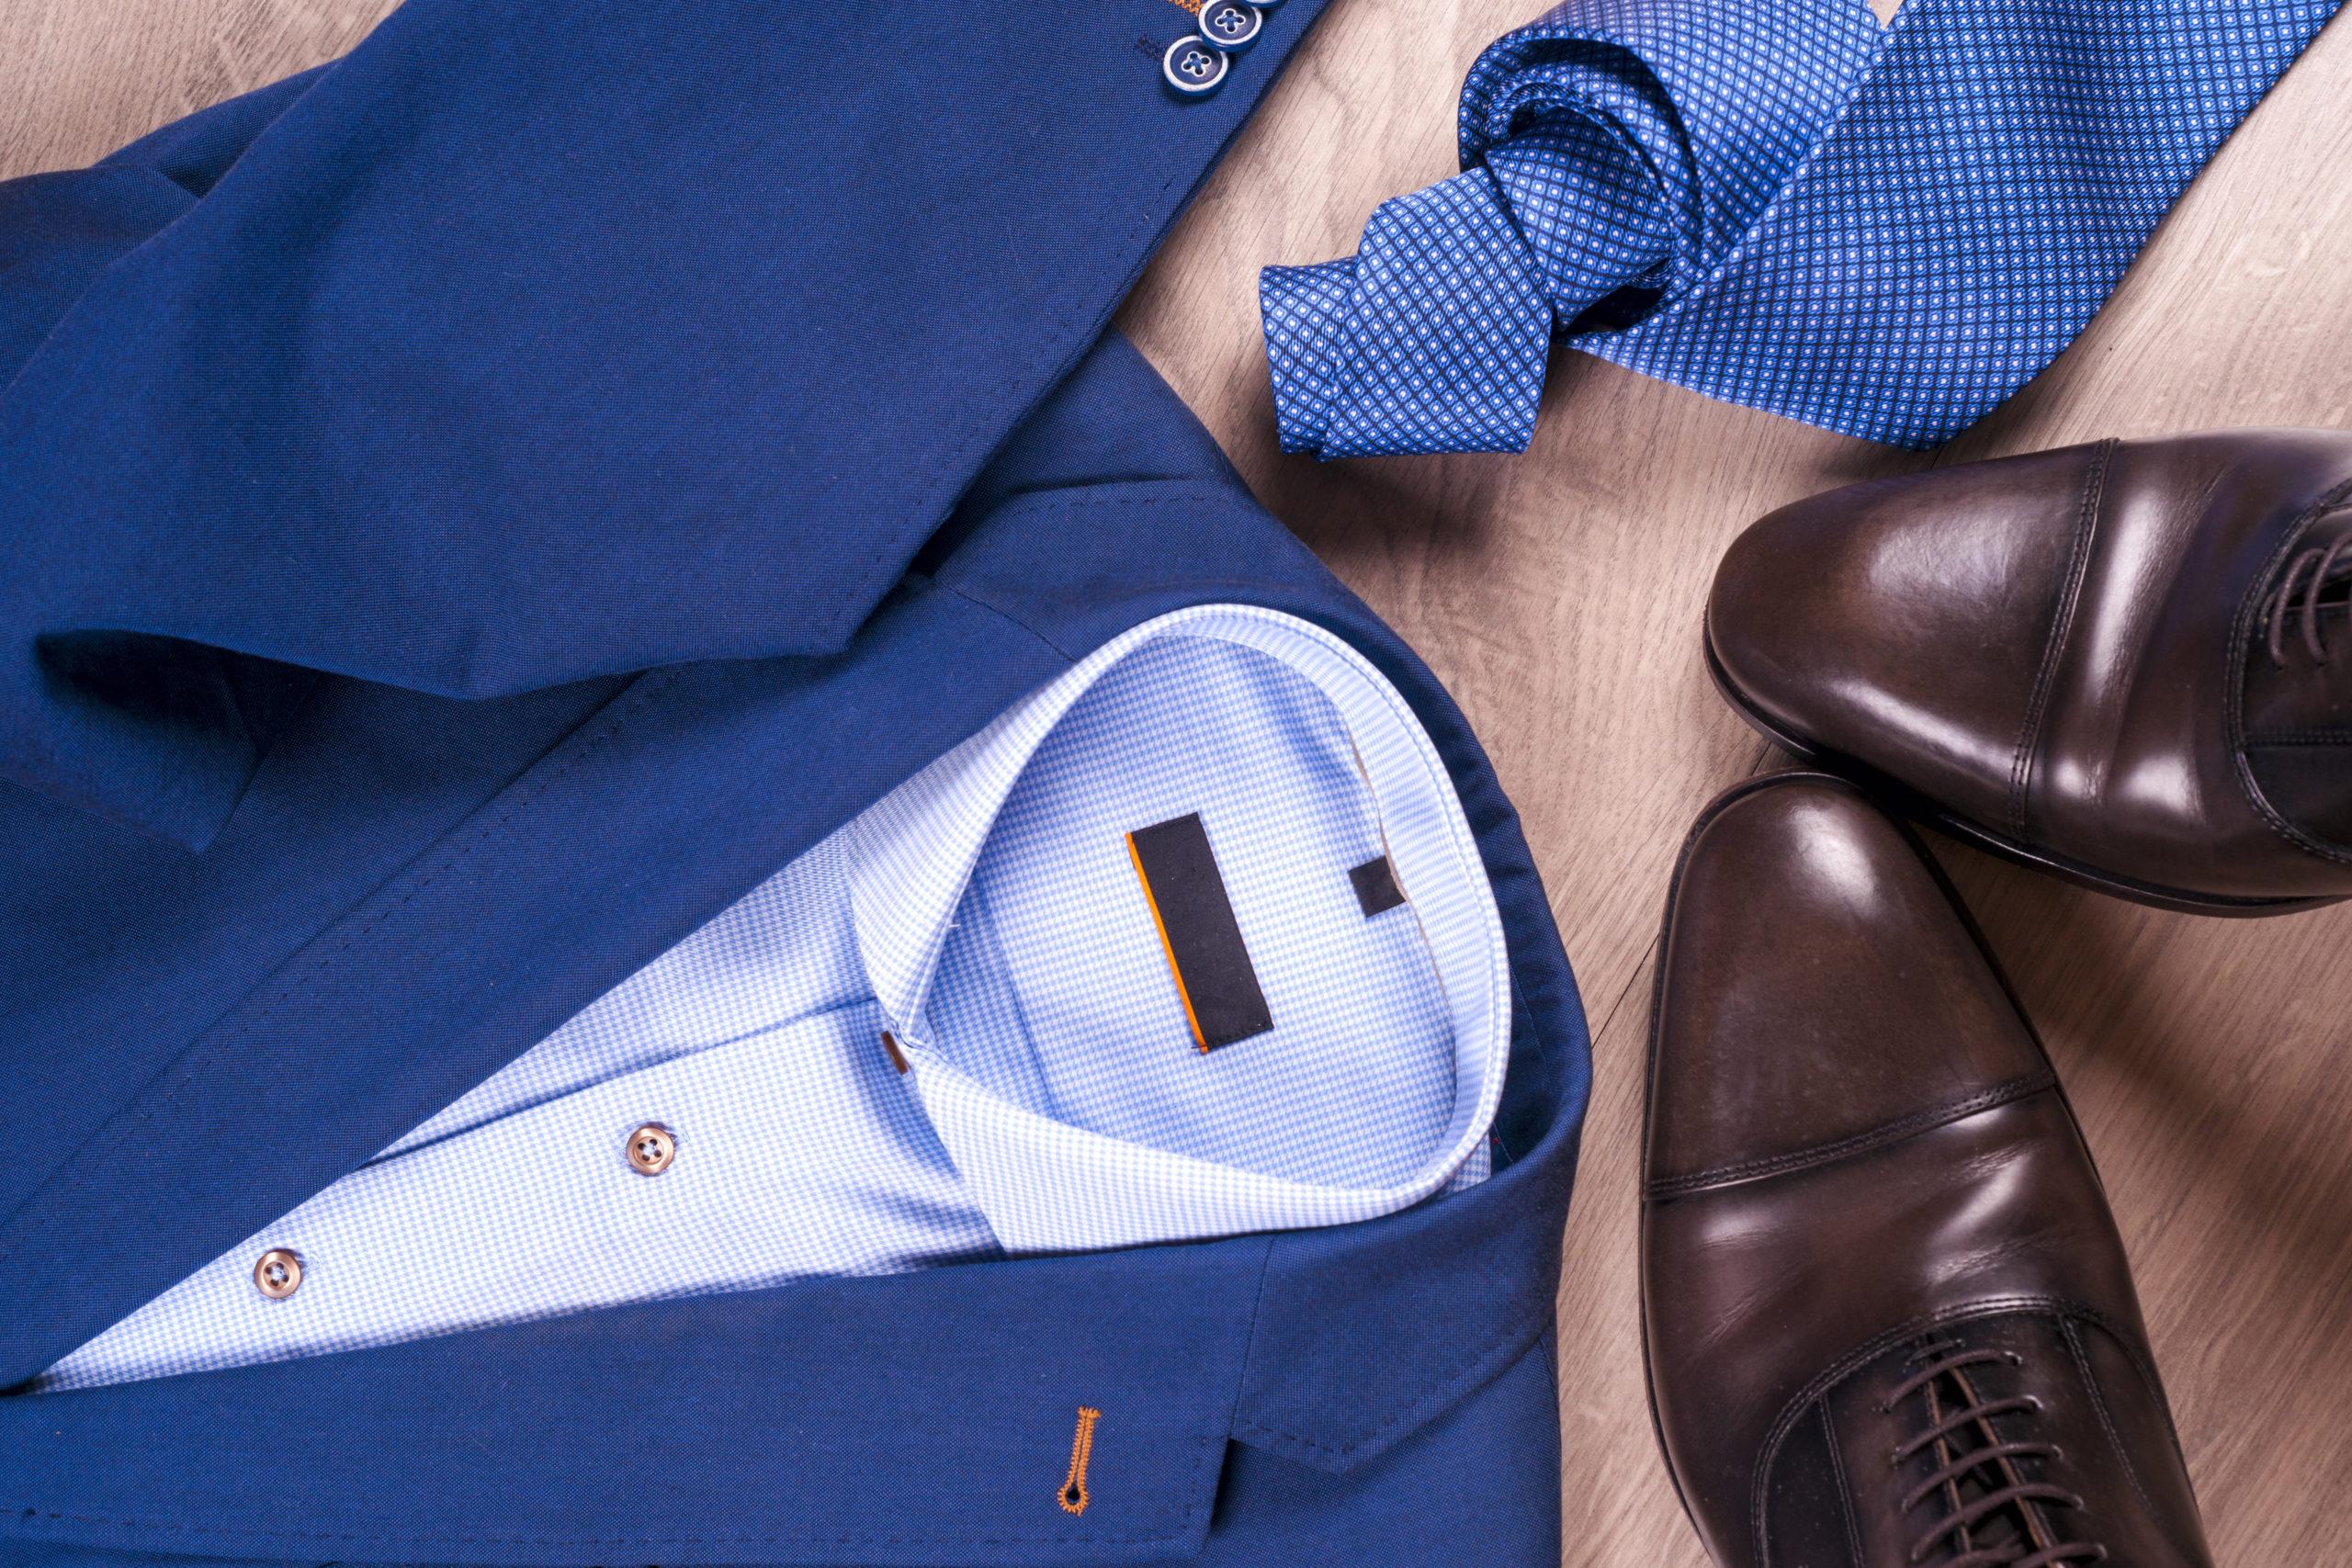 Set,Of,Classic,Mens,Clothes,-,Blue,Suit,,Shirts,,Brown